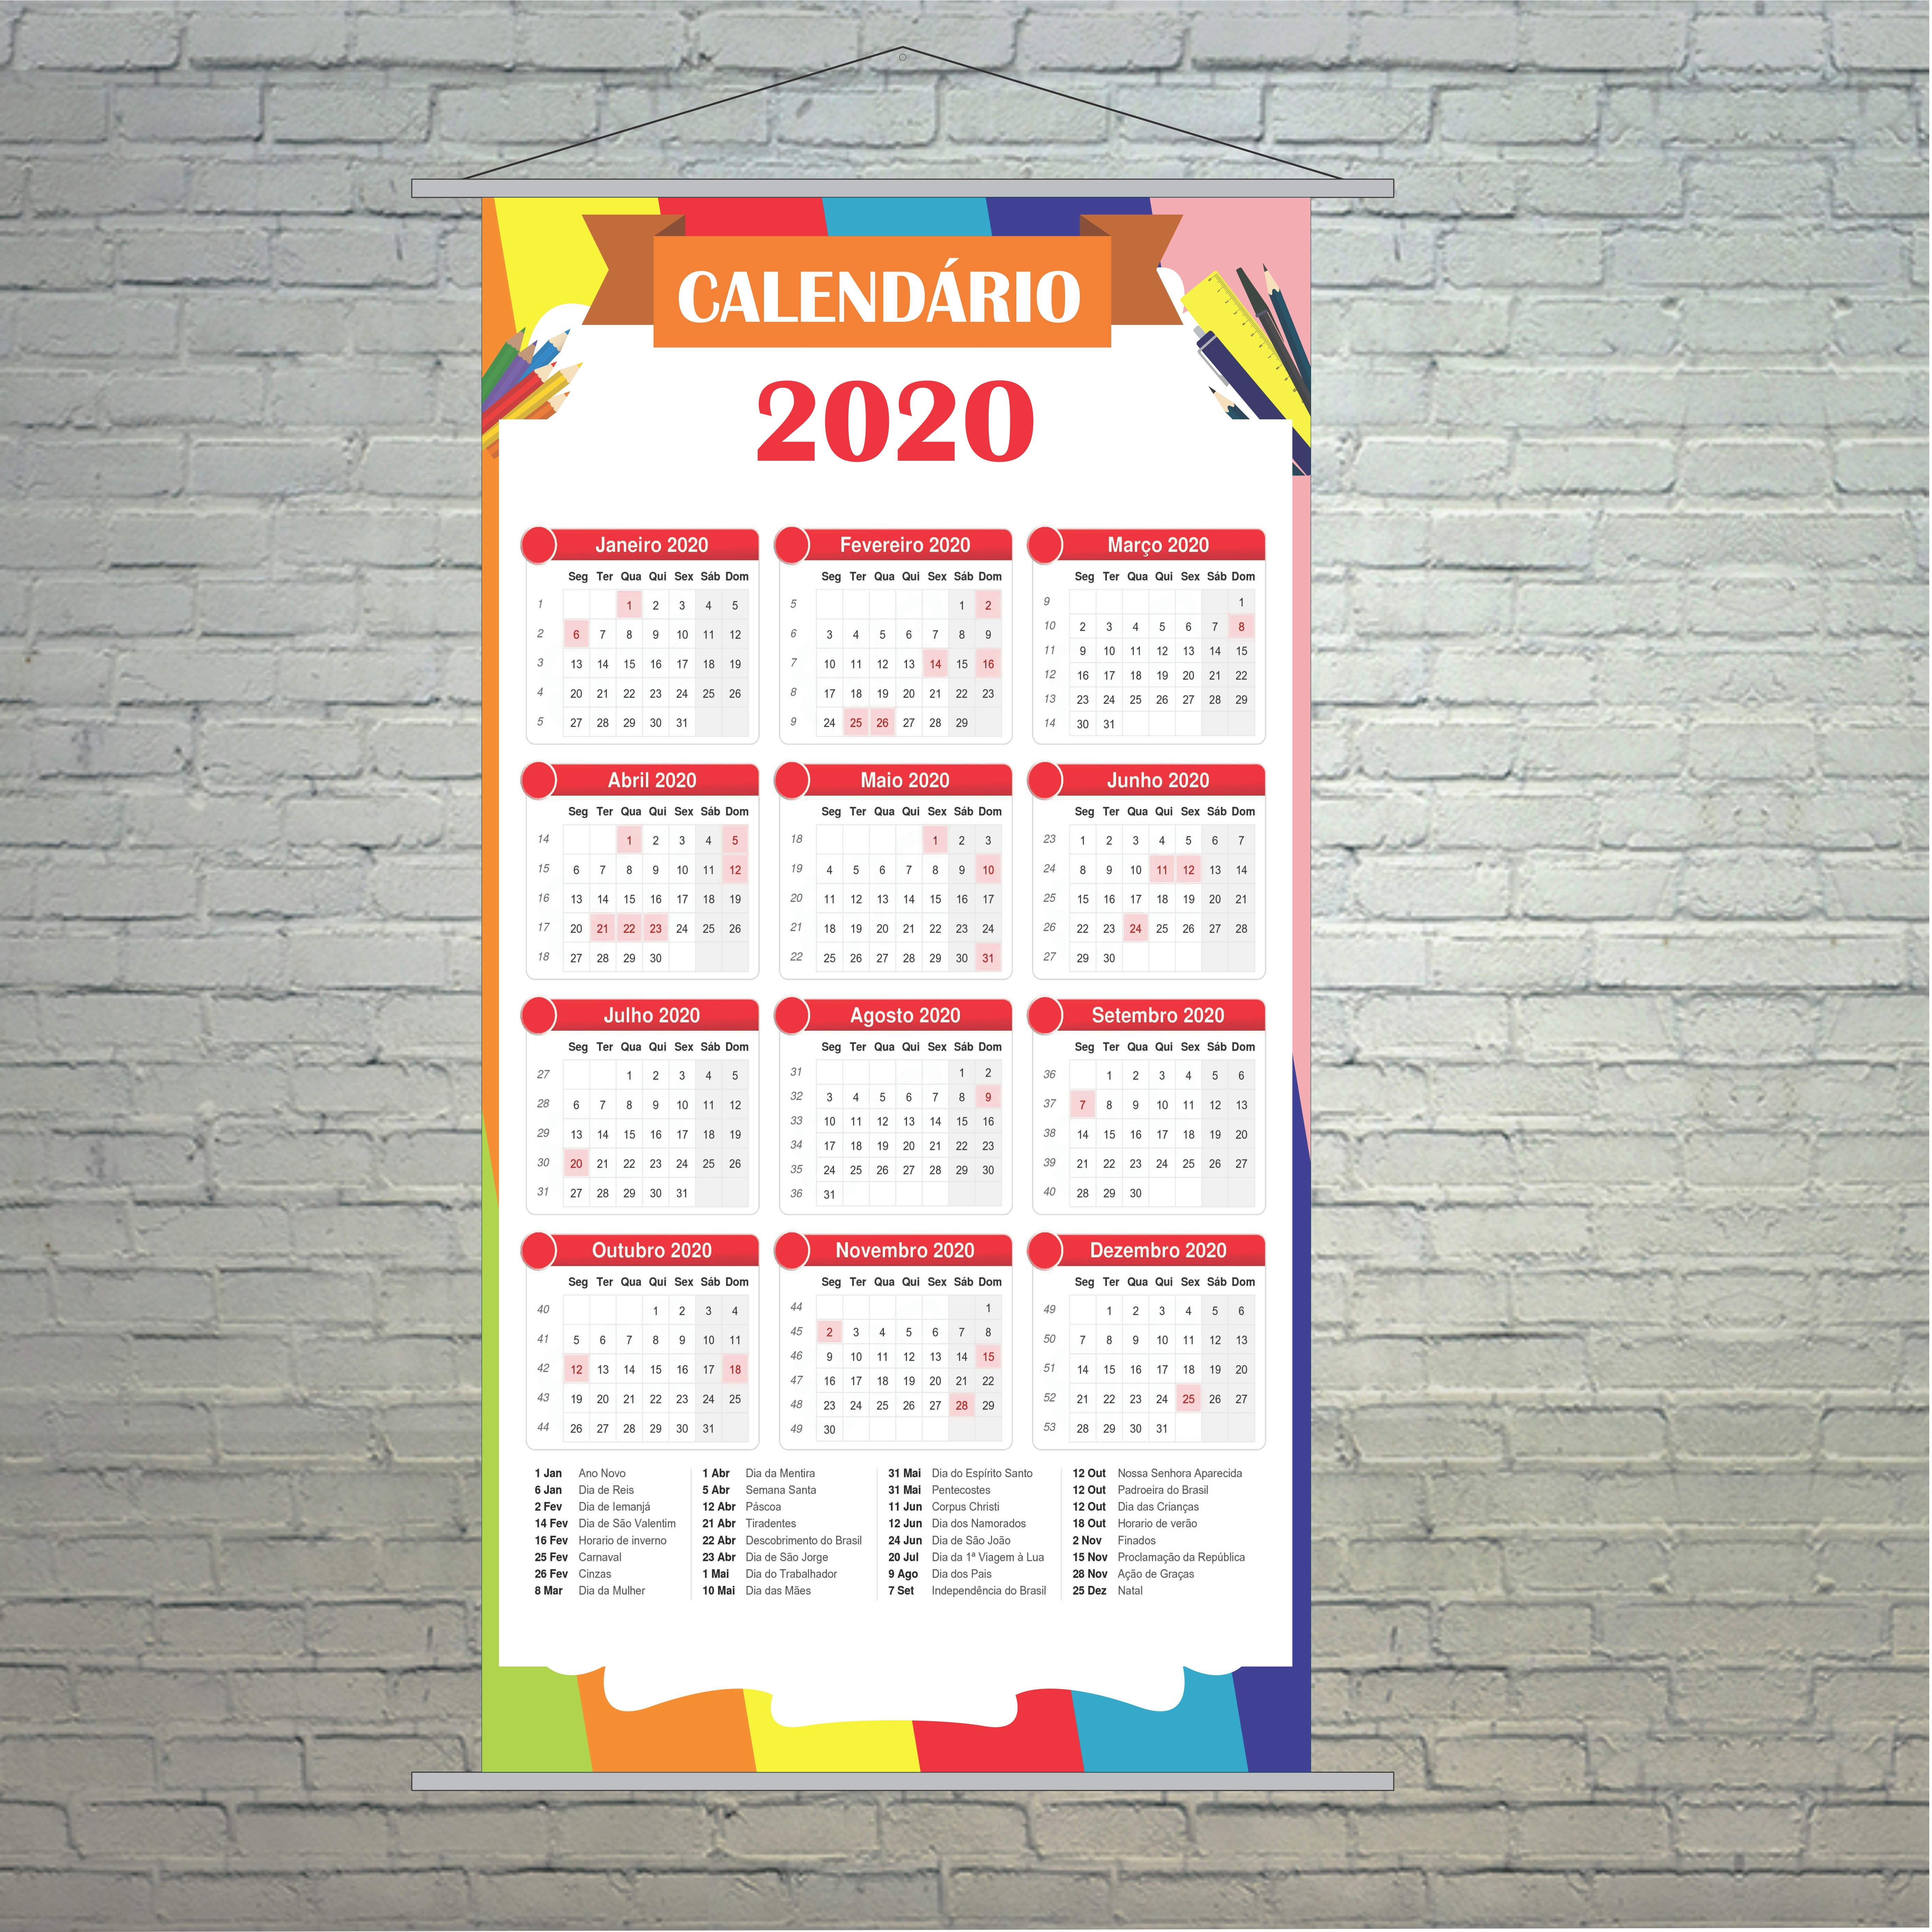 Calendario Janeiro 2020 Brasil Más Recientemente Liberado Calendarios Pedagogicos Of Calendario Janeiro 2020 Brasil Recientes Pnld17 Col Integralis Geografia 8º No Pages 51 100